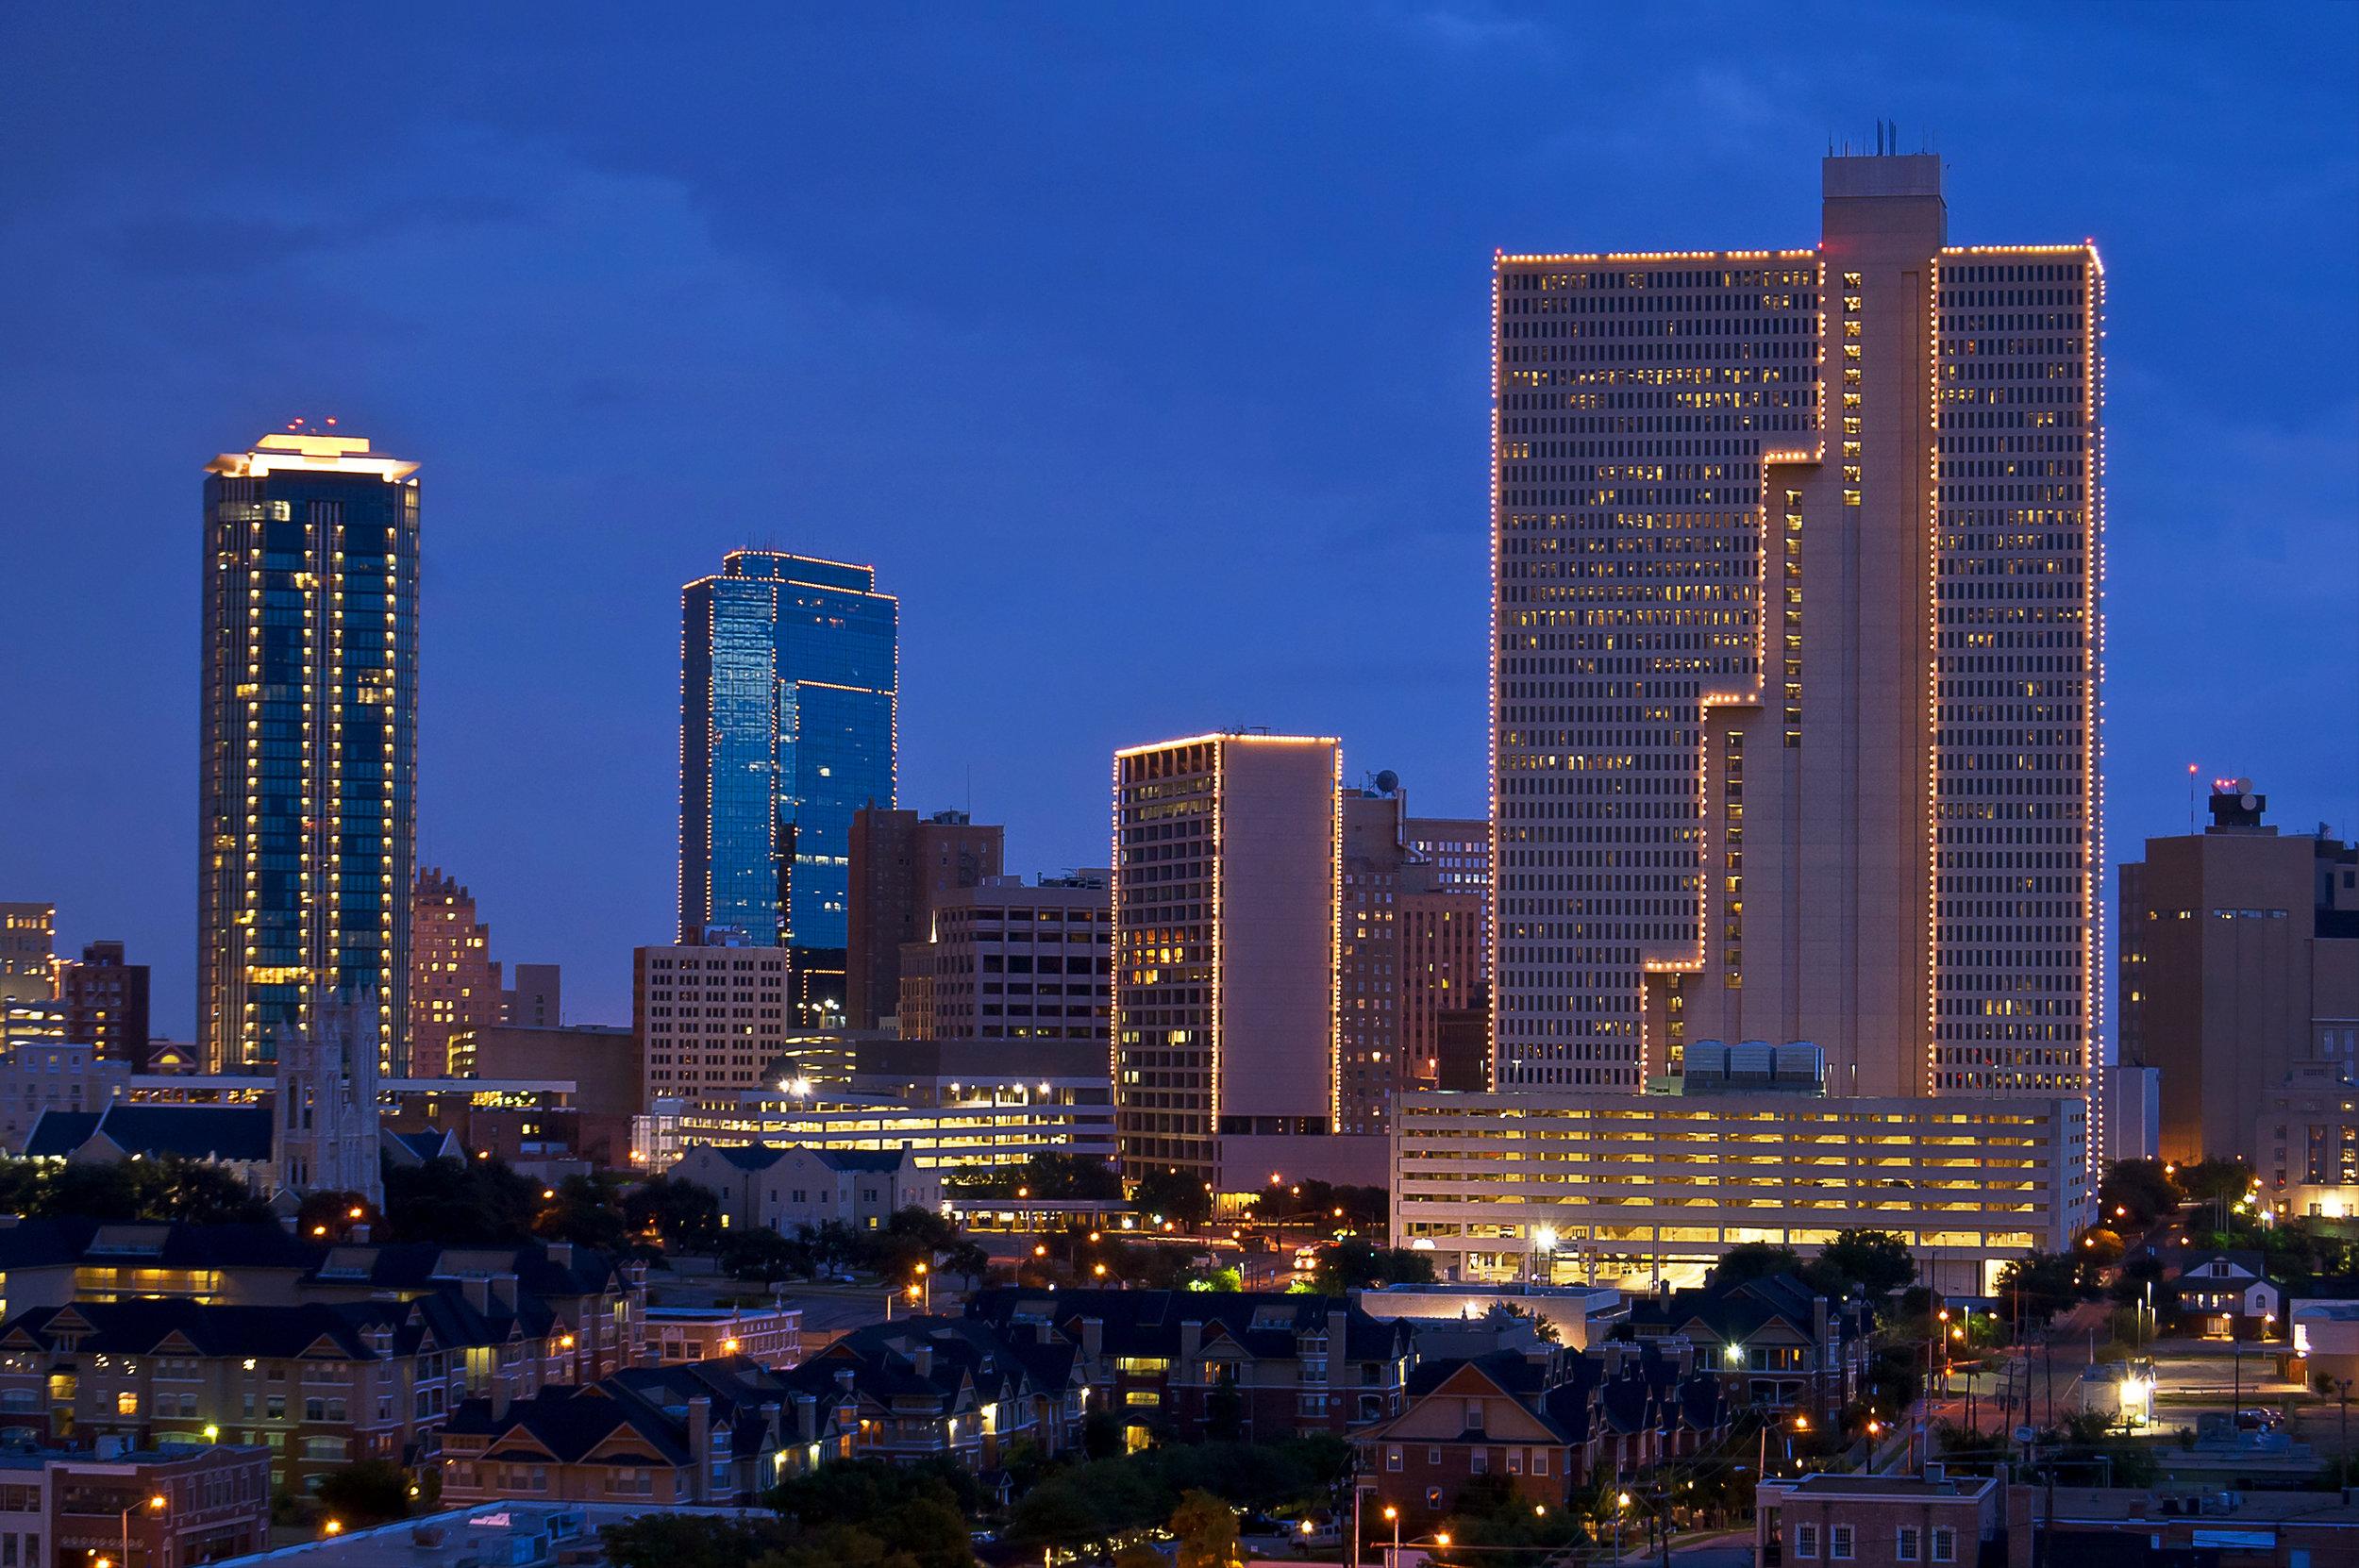 Fort Worth shutterstock_107576585.jpg